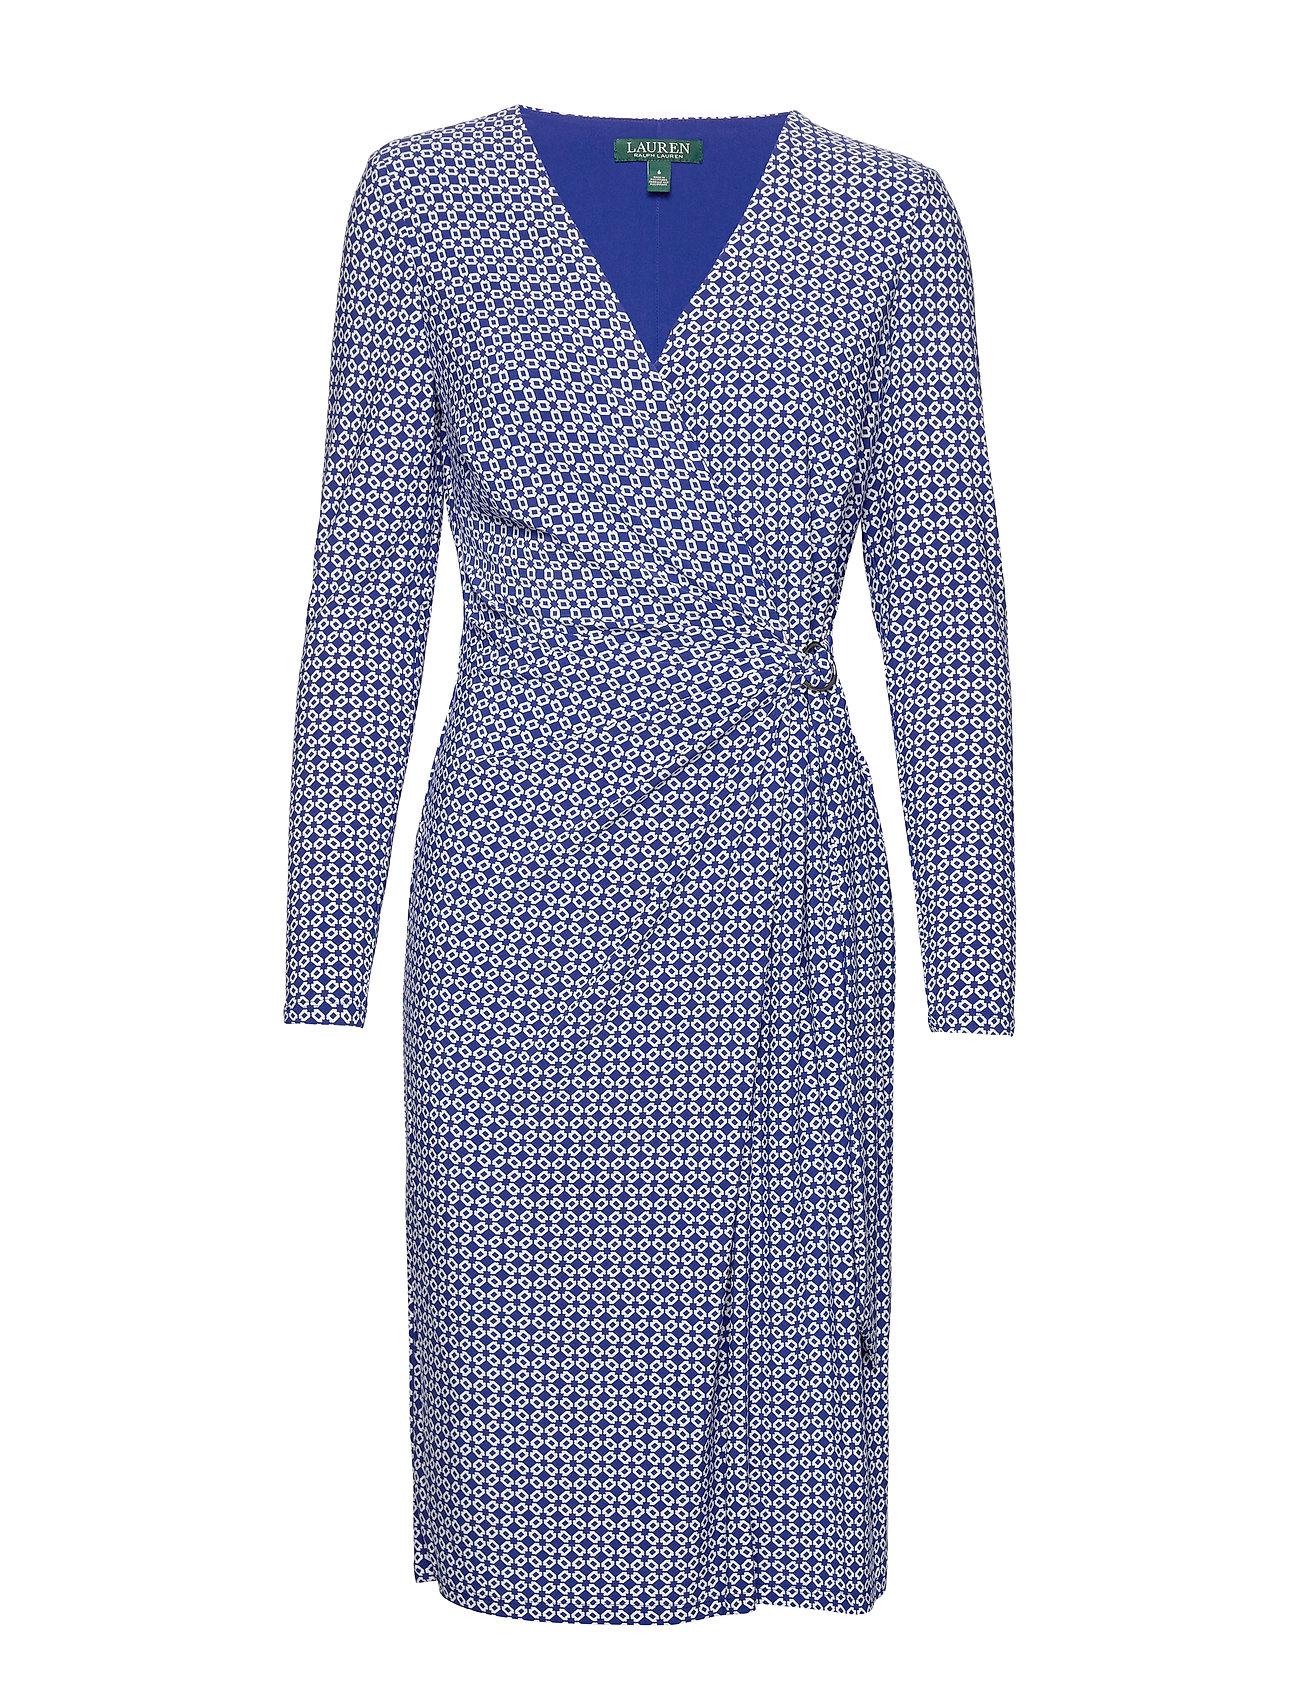 Lauren Ralph Lauren PRINTED MATTE JRSY-DRESS W/ TRIM - PARISIAN BLUE/COL